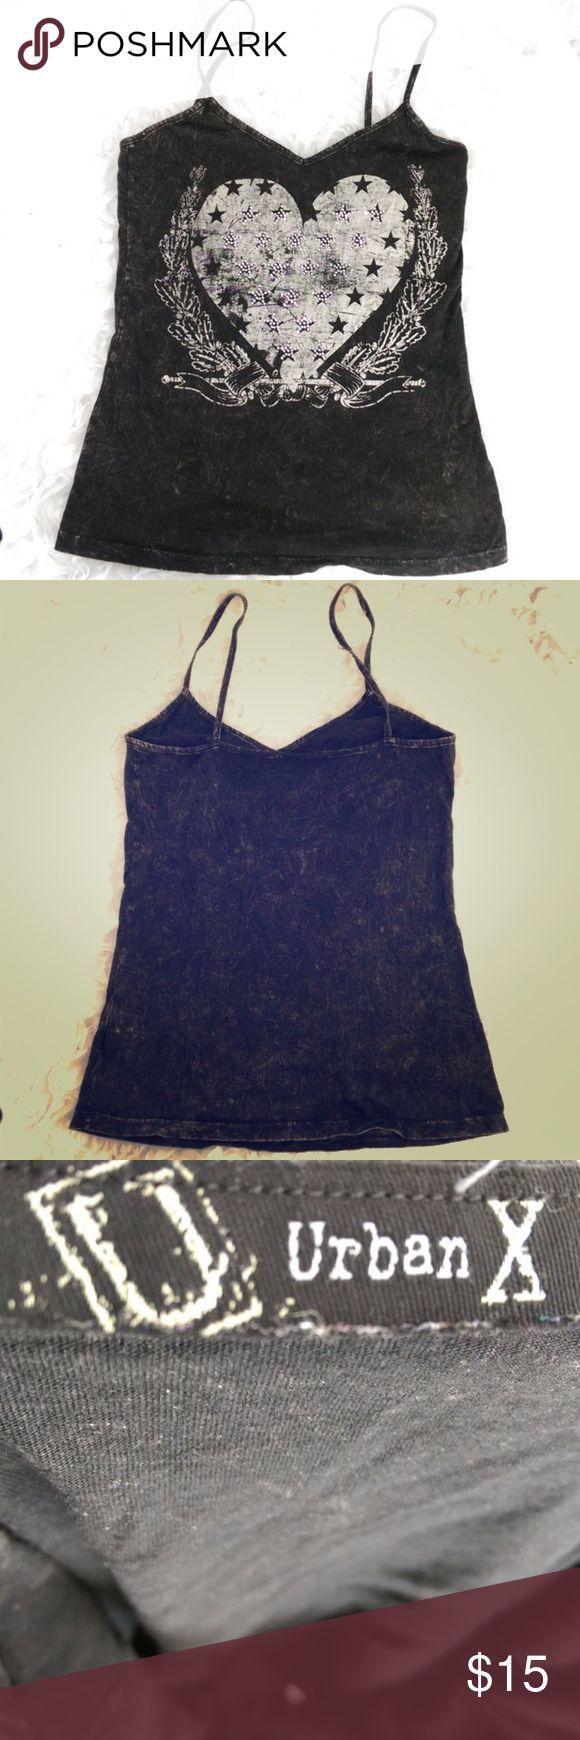 "Women's Tank Cami Women's Tank Cami Top  Size Small  URBAN X  Black Gray  Stonewashed  Heart Stars Embellished Armpit to Armpit - 30""   Shoulder to Hem - 25.5"" Hem Circumference - 32"" Urban X Tops Camisoles"